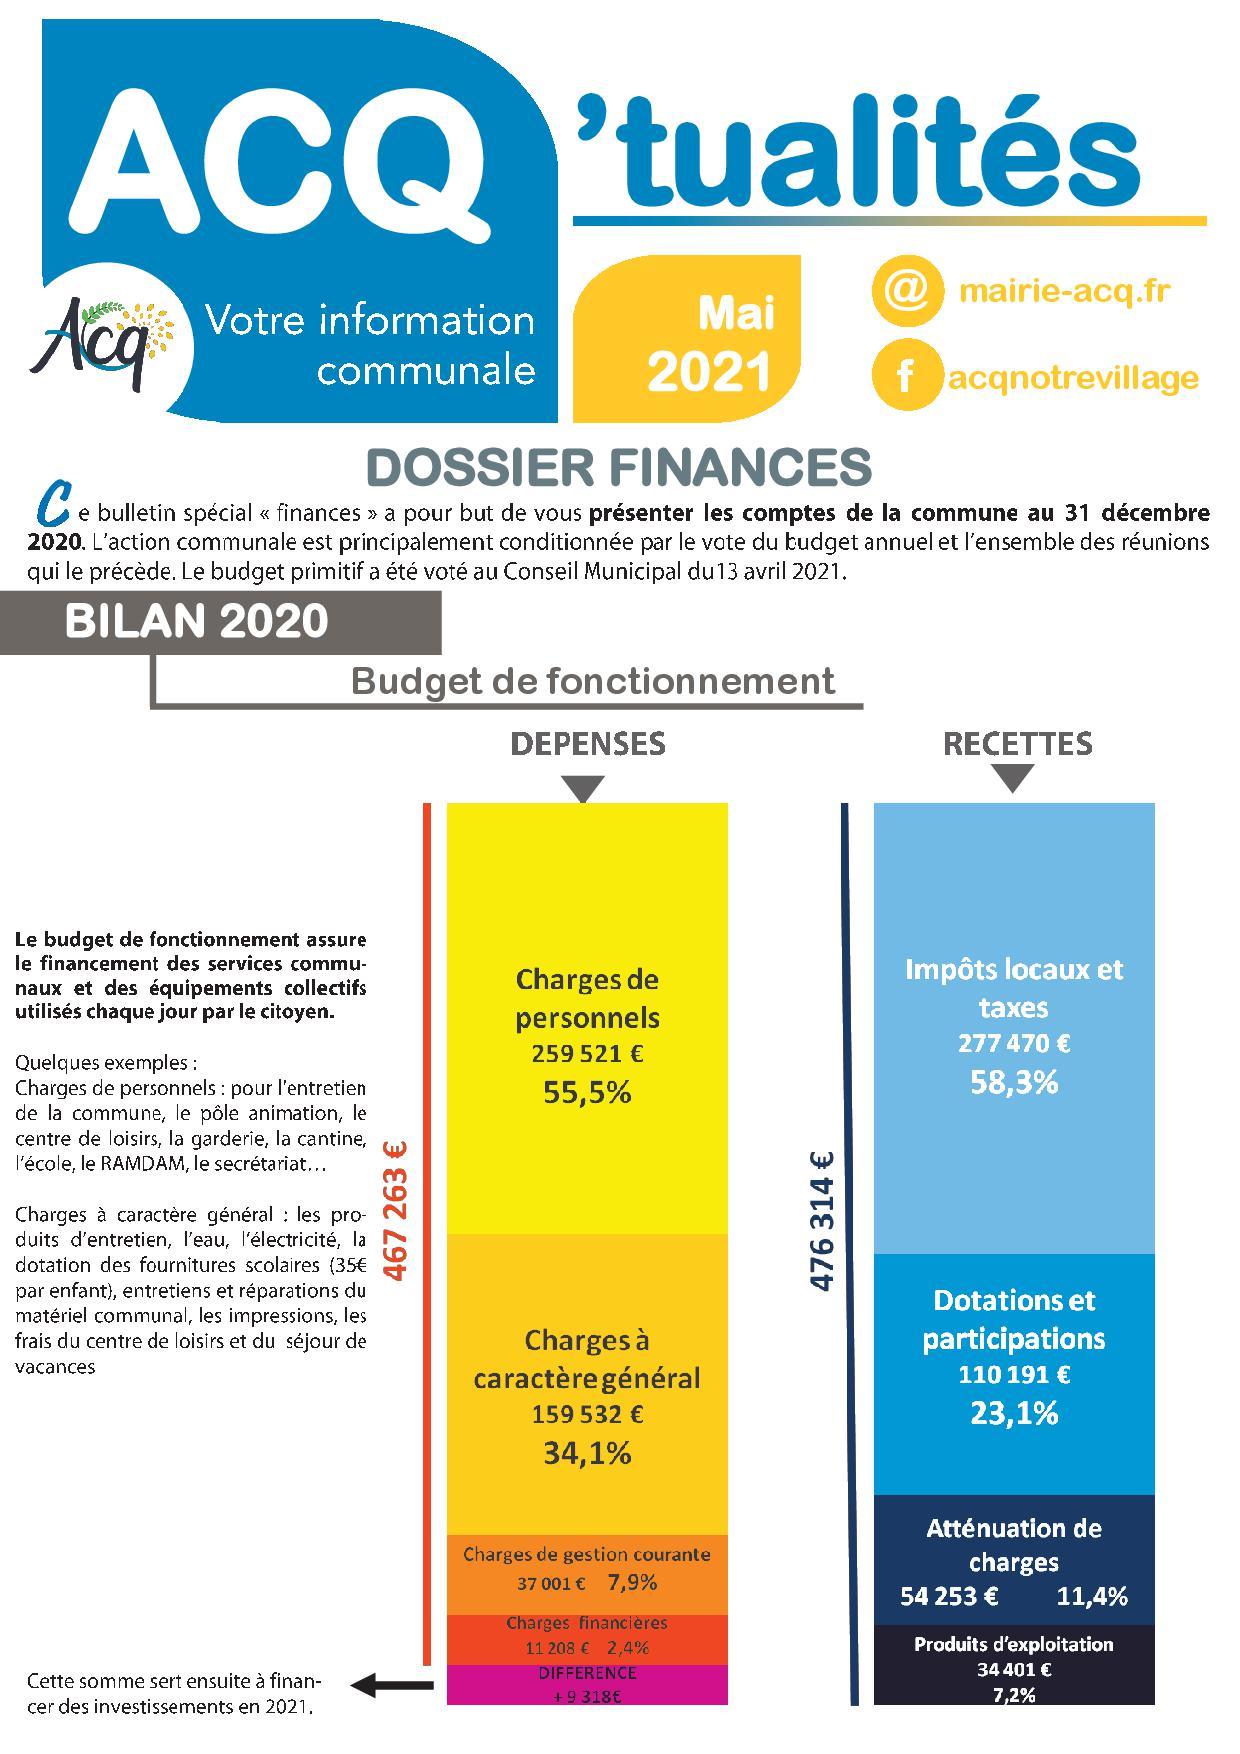 Acq_tualités Mai 2021 Finances.jpg